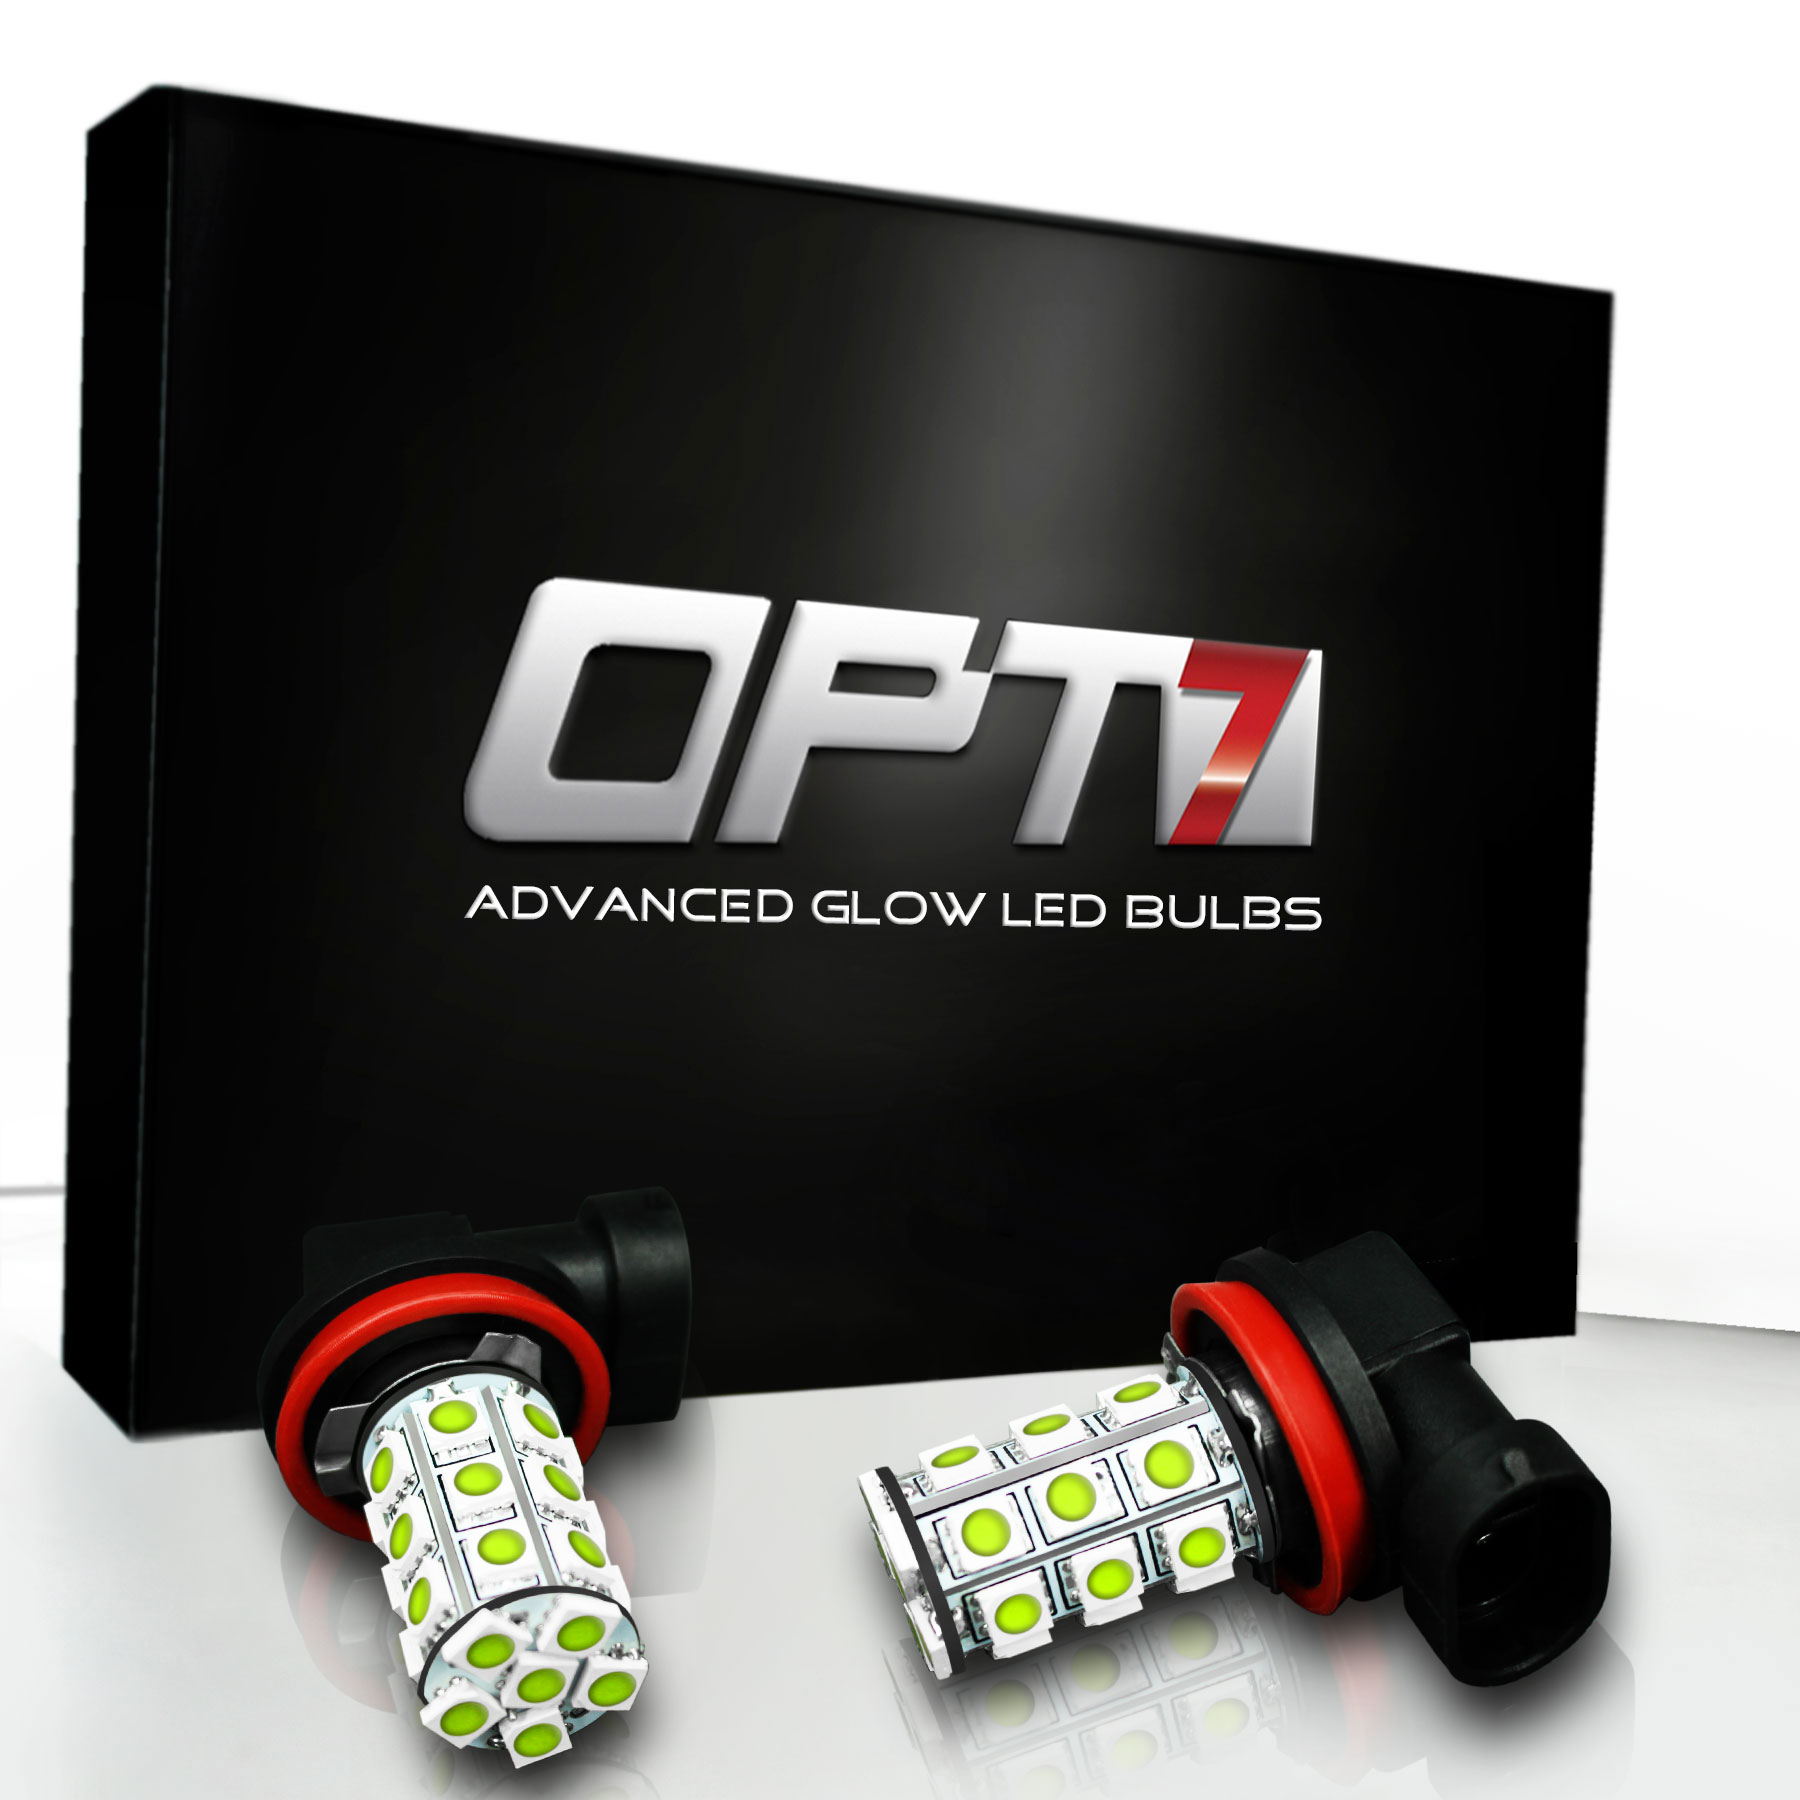 OPT7 Show Glow H11 LED Fog Light Bulbs - 27-SMD 6000K Cool White @ 350Lm per bulb - Plug-n-Play (Pack of 2)